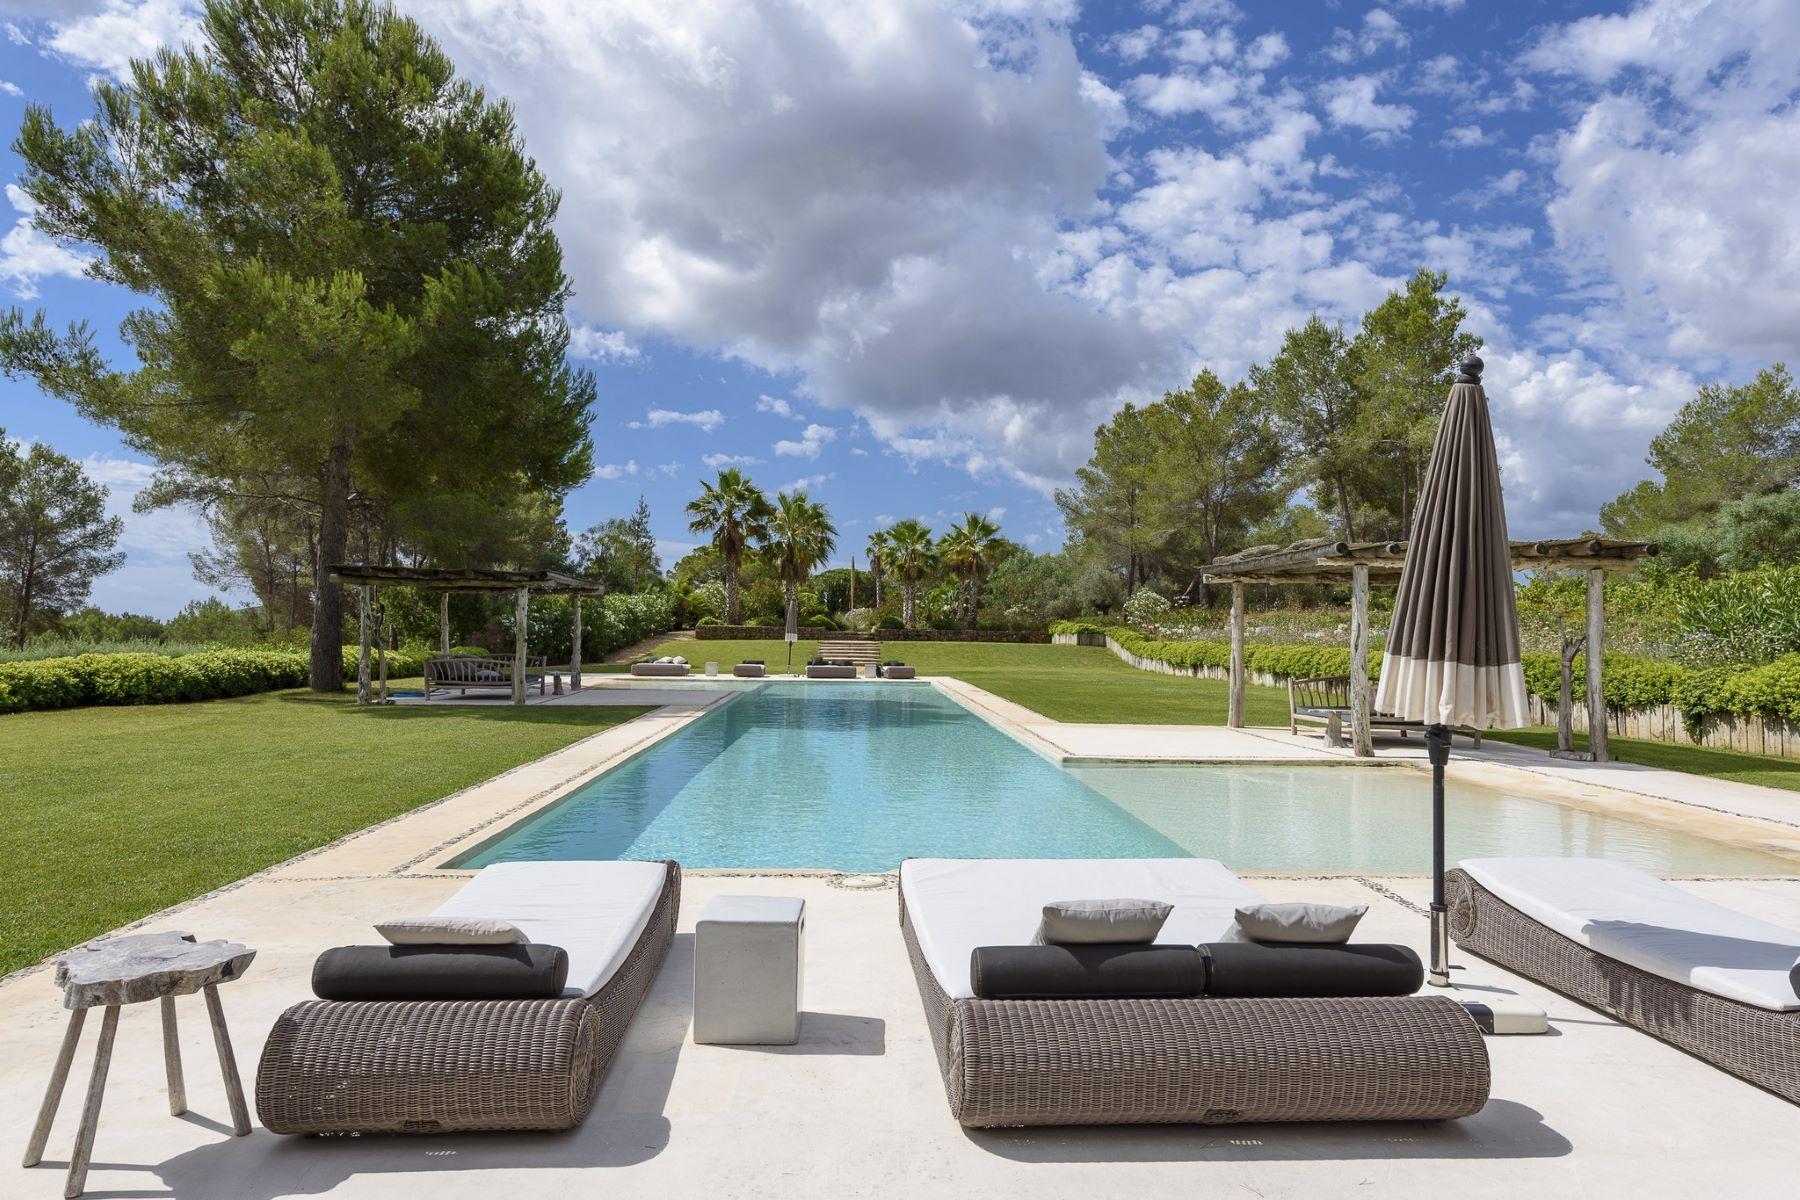 Single Family Home for Sale at Distinctive Ibizan Style 4 Homes, 3 Pools & Absolute Privacy near Santa Eulalia Ibiza, Balearic Islands Spain